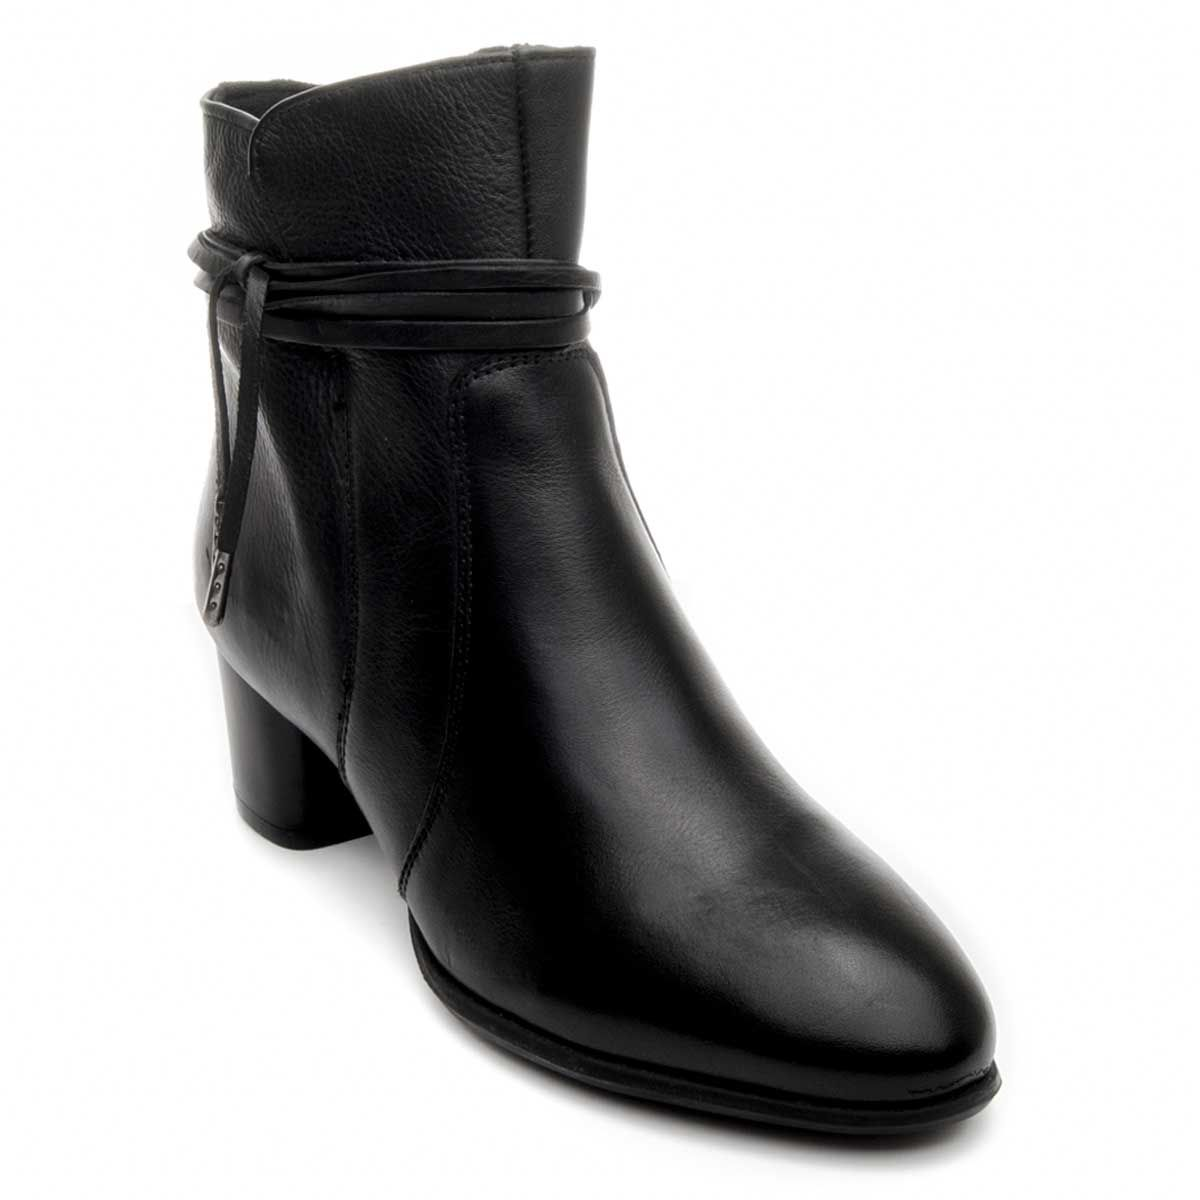 Purapiel Cord Tie Heeled Ankle Boot in Black